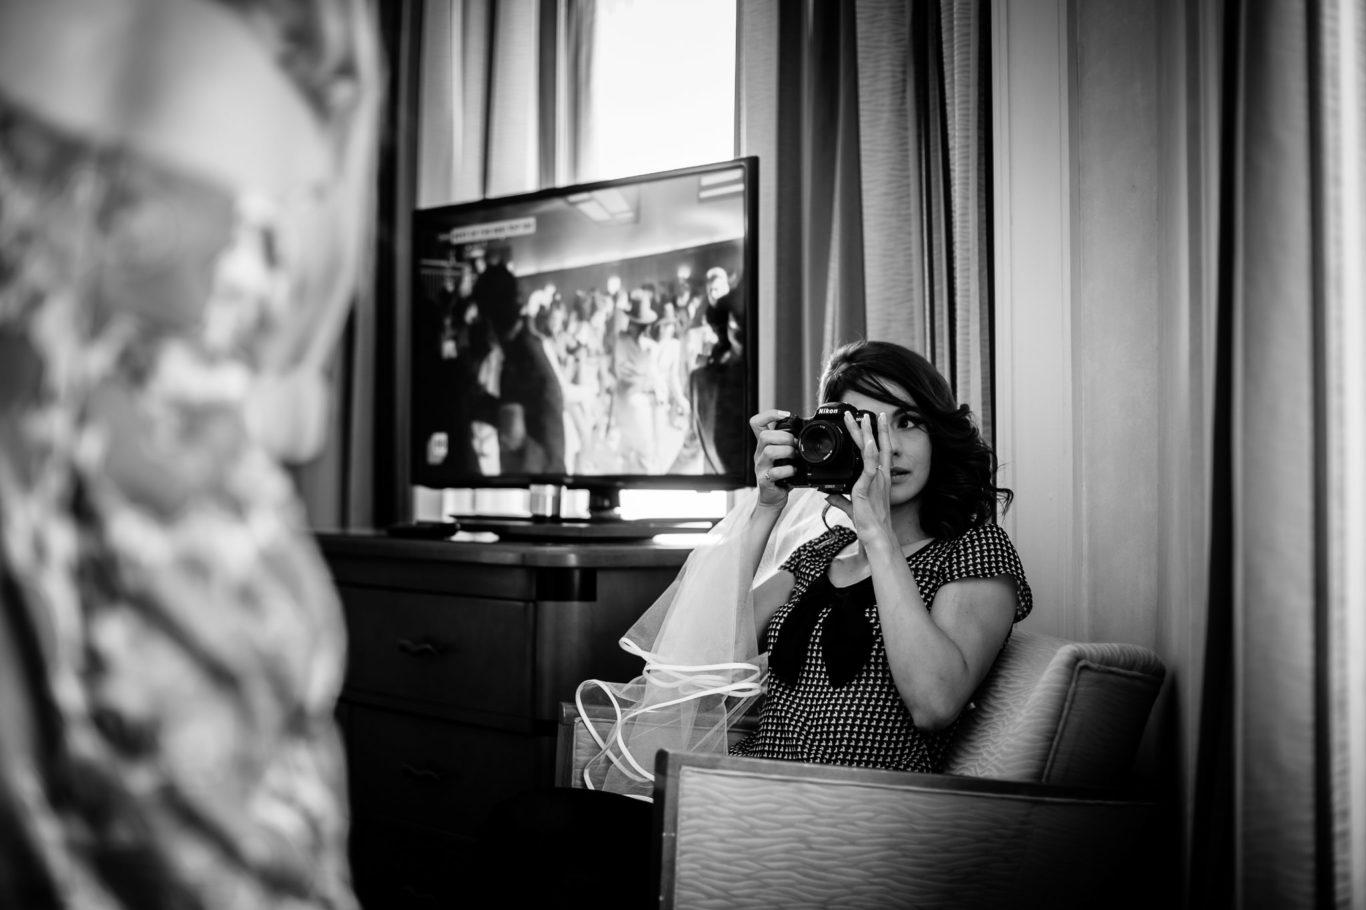 0216-fotografie-nunta-bucuresti-dana-radu-fotograf-ciprian-dumitrescu-cd2_6747